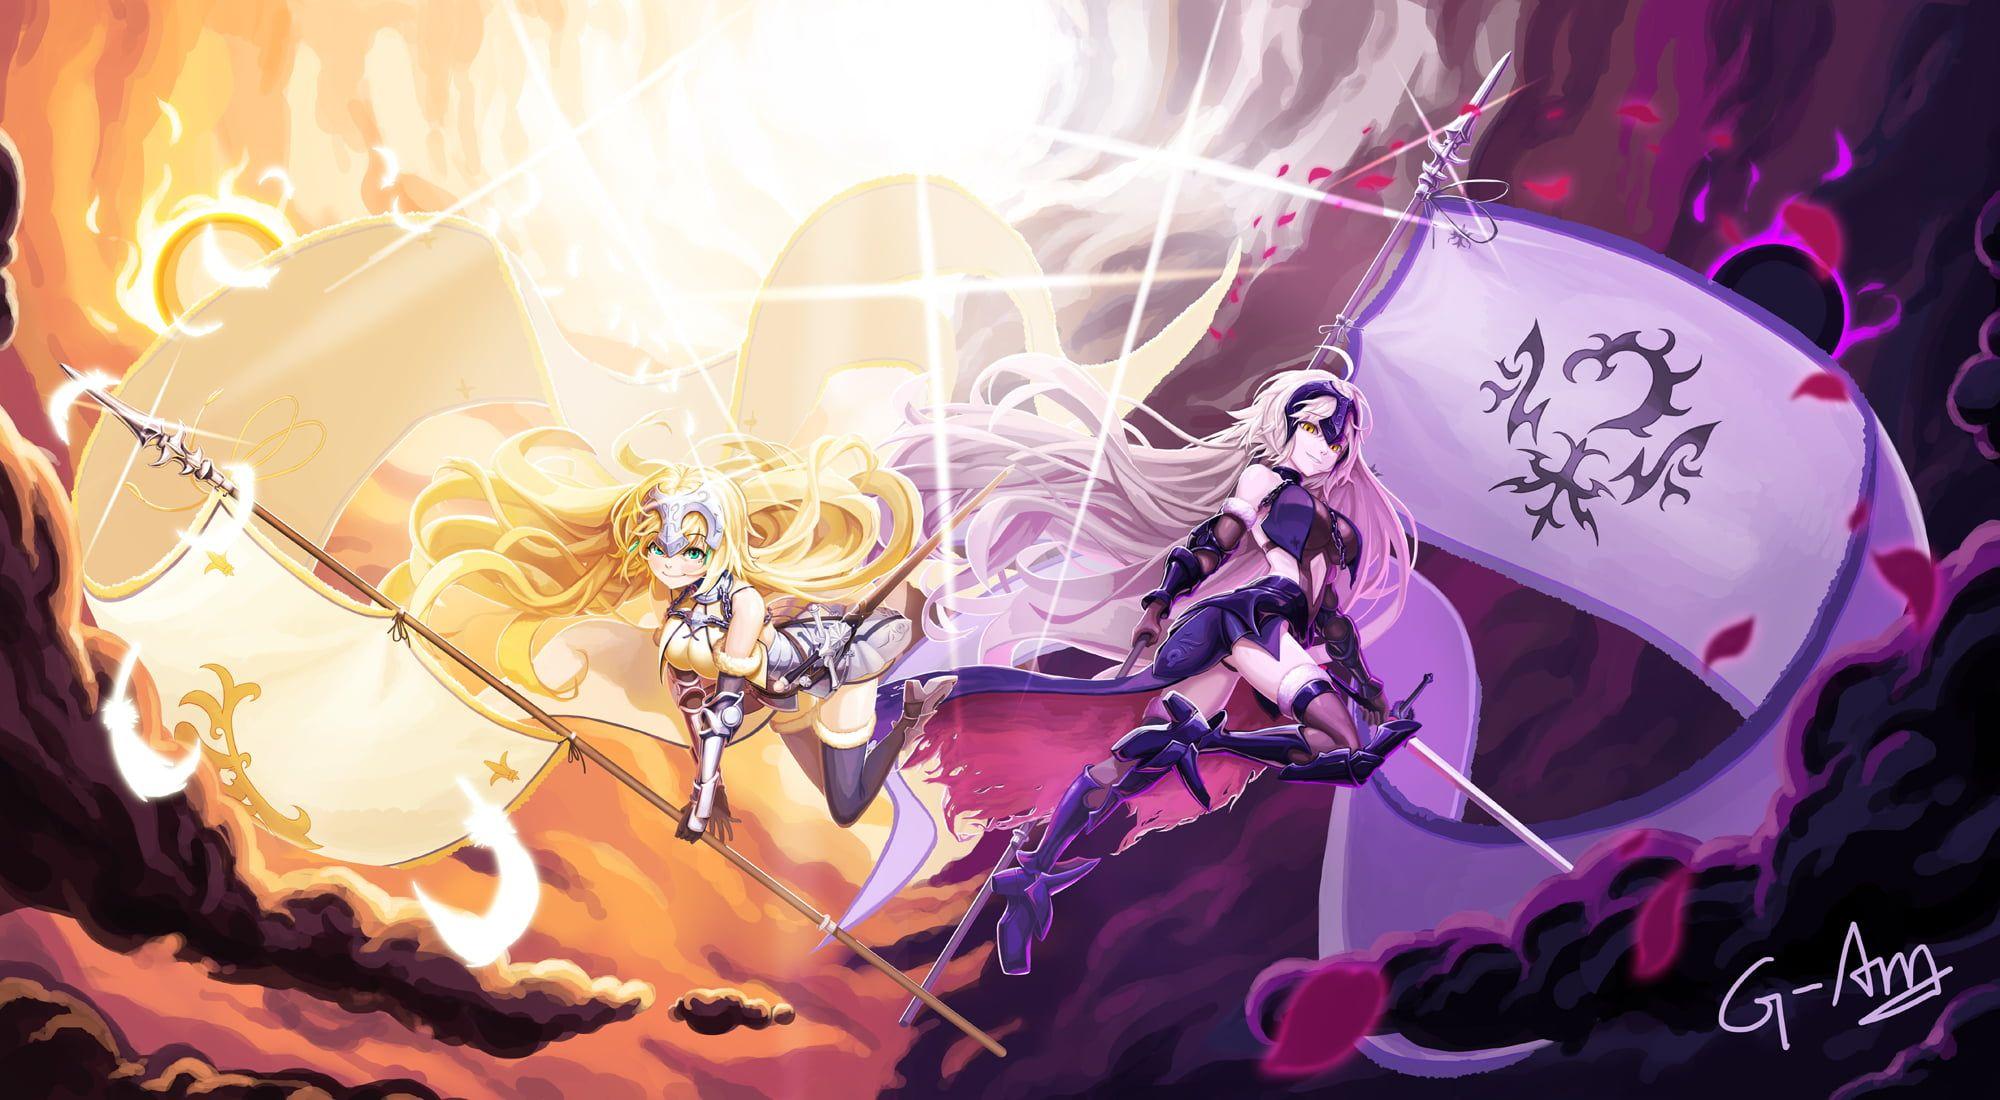 Fategrand order fate series ruler fateapocrypha